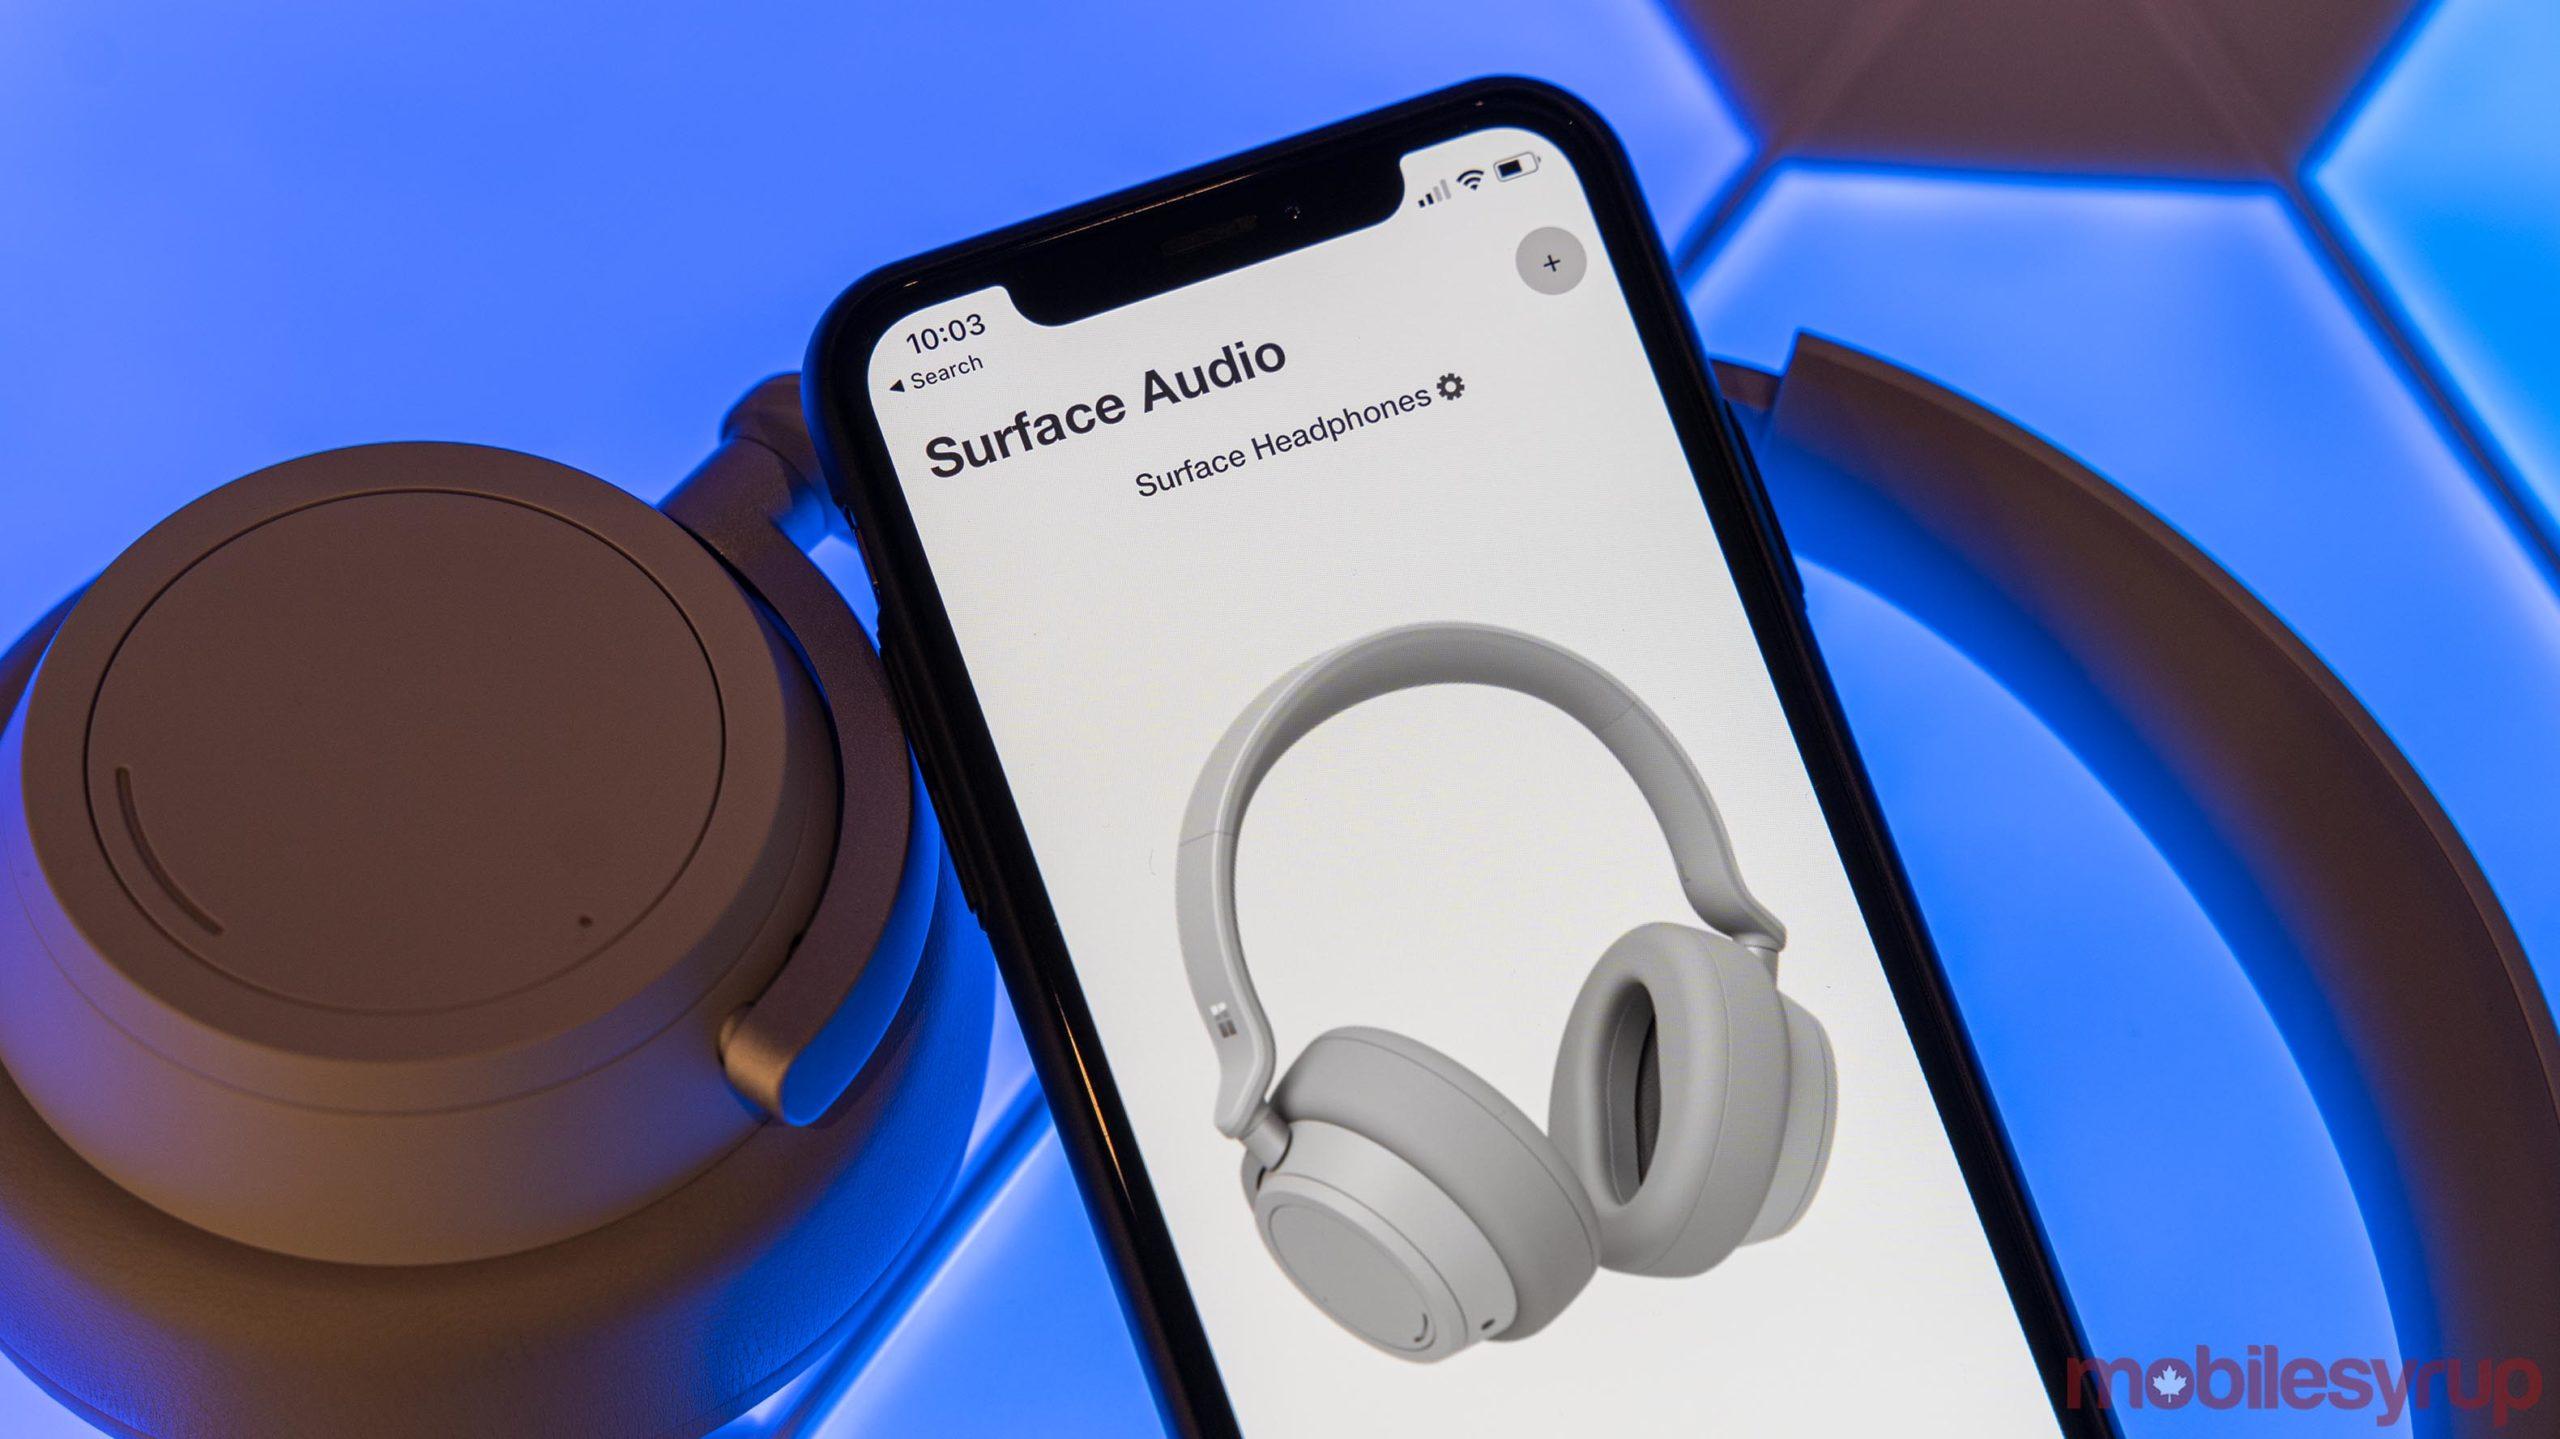 Surface Audio app